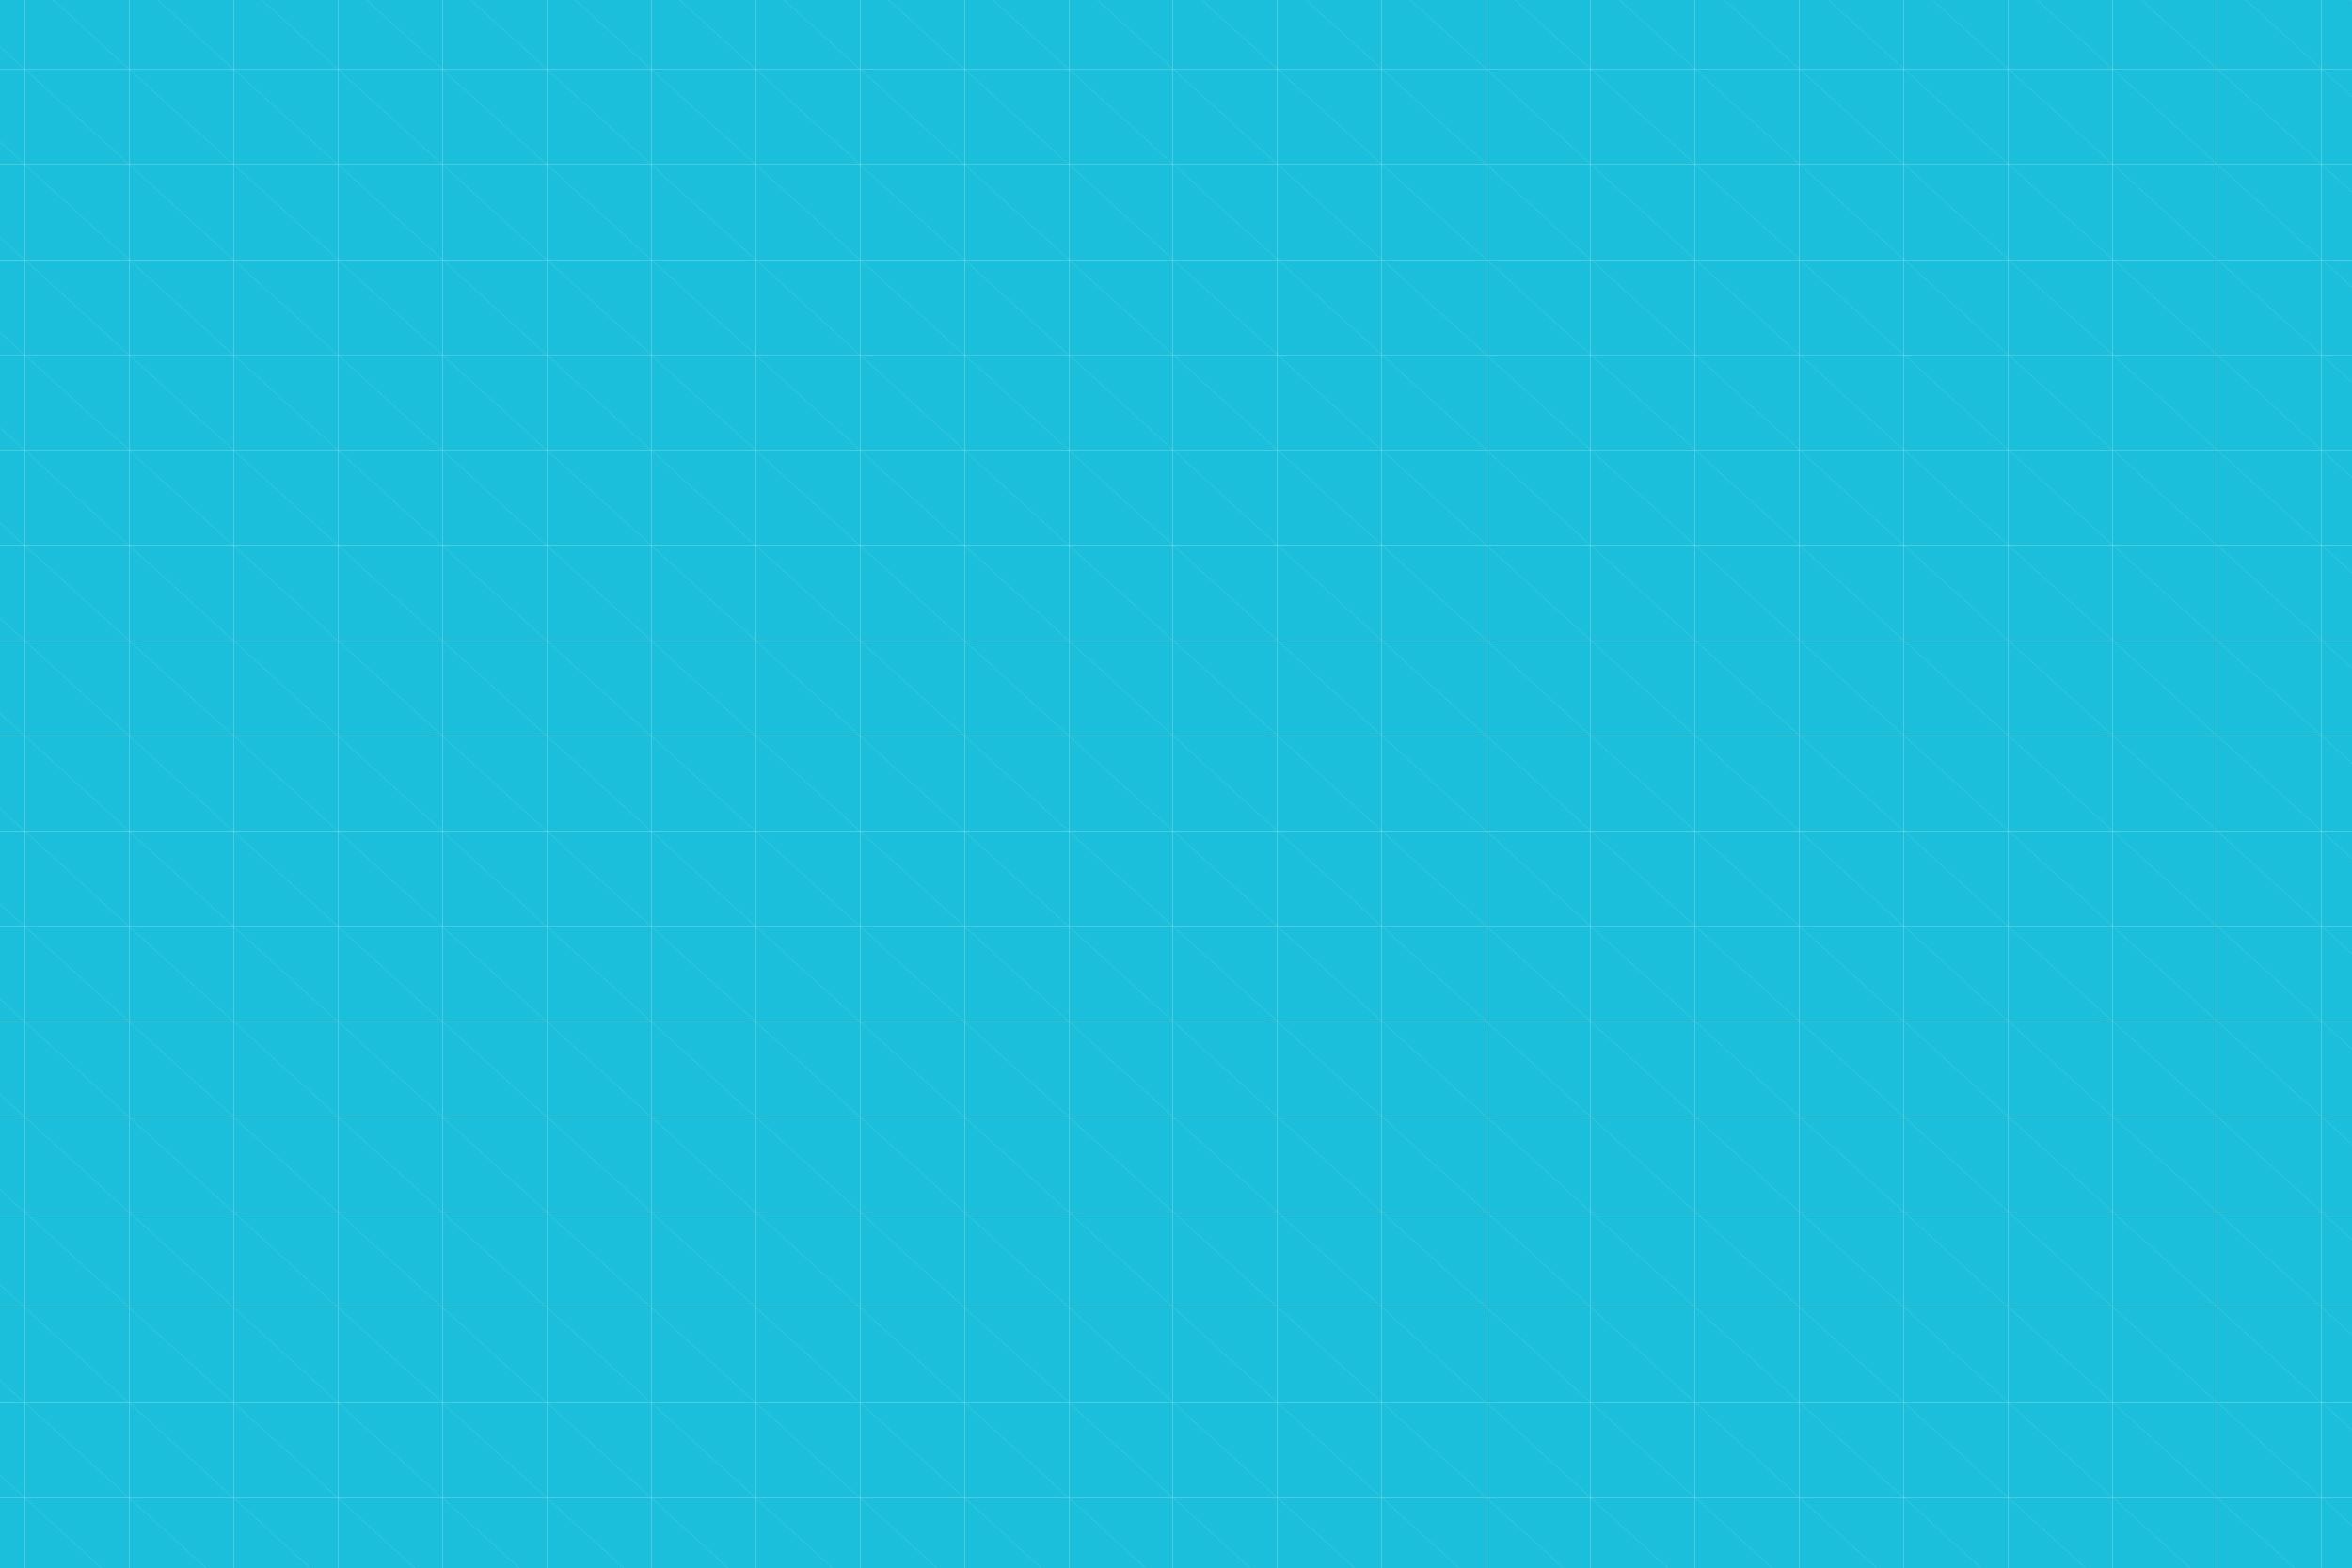 apto-web-banner-texture-turquoise-701